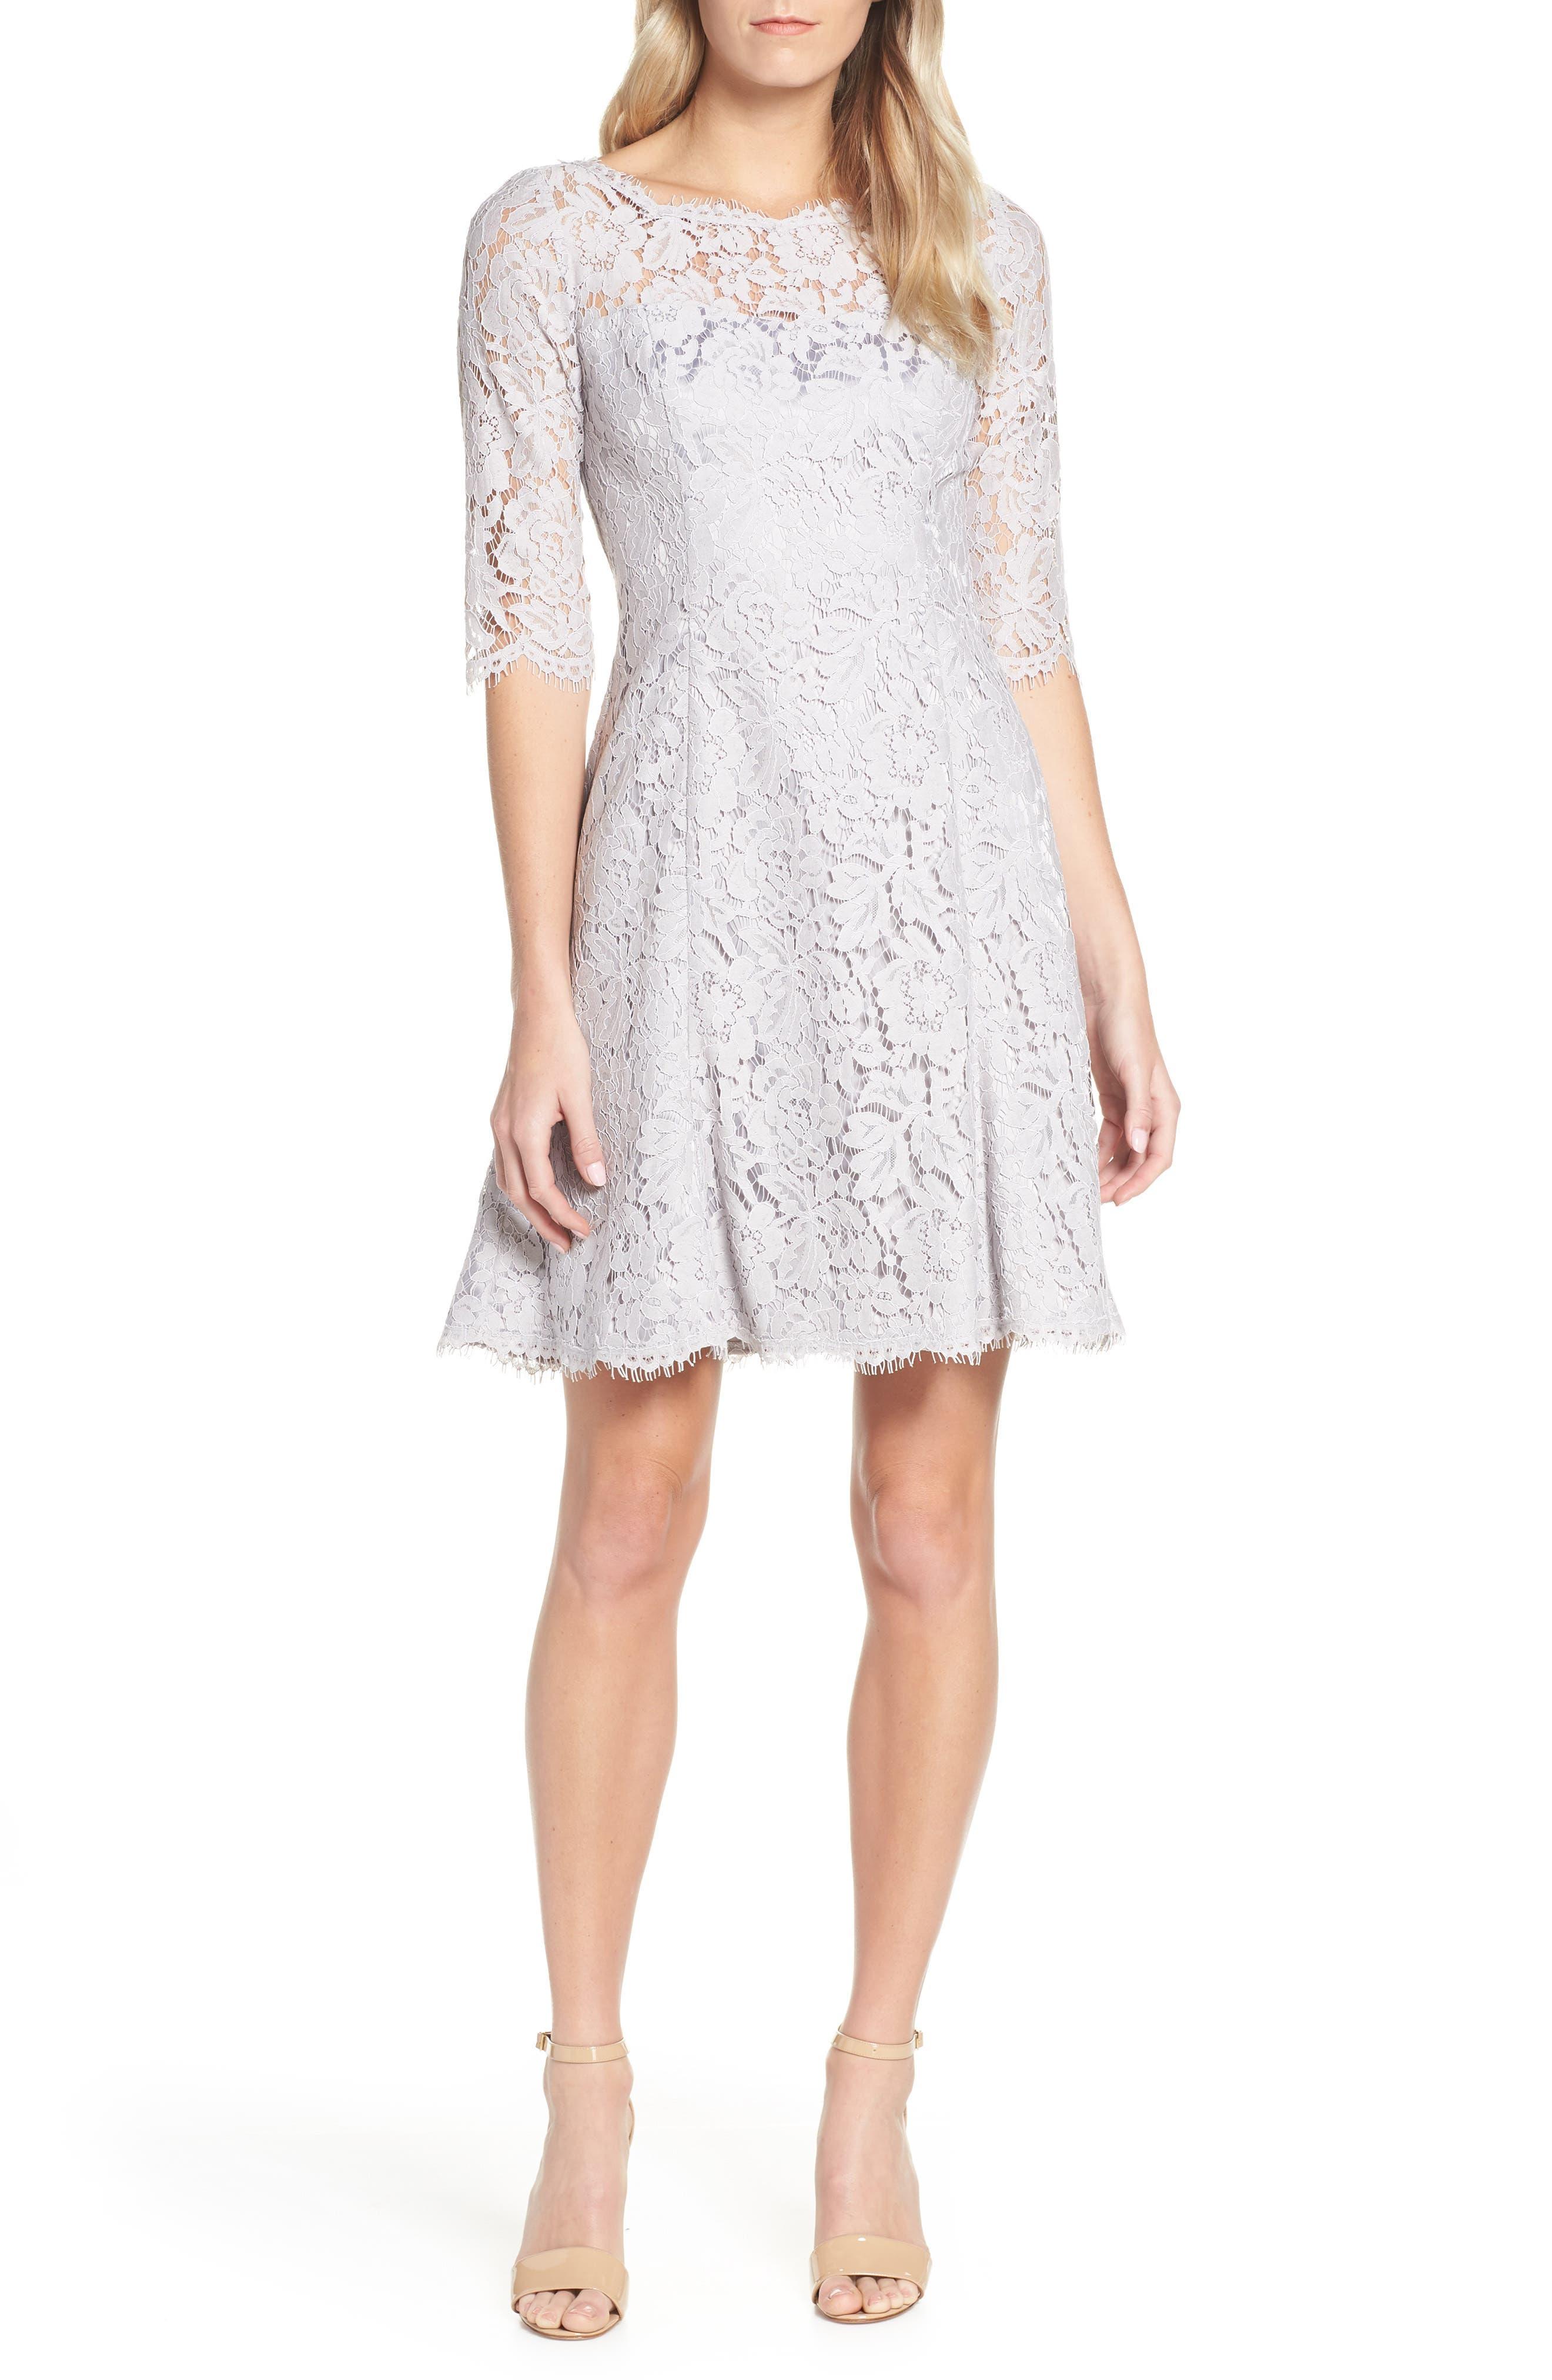 ELIZA J Lace Fit & Flare Cocktail Dress, Main, color, GREY